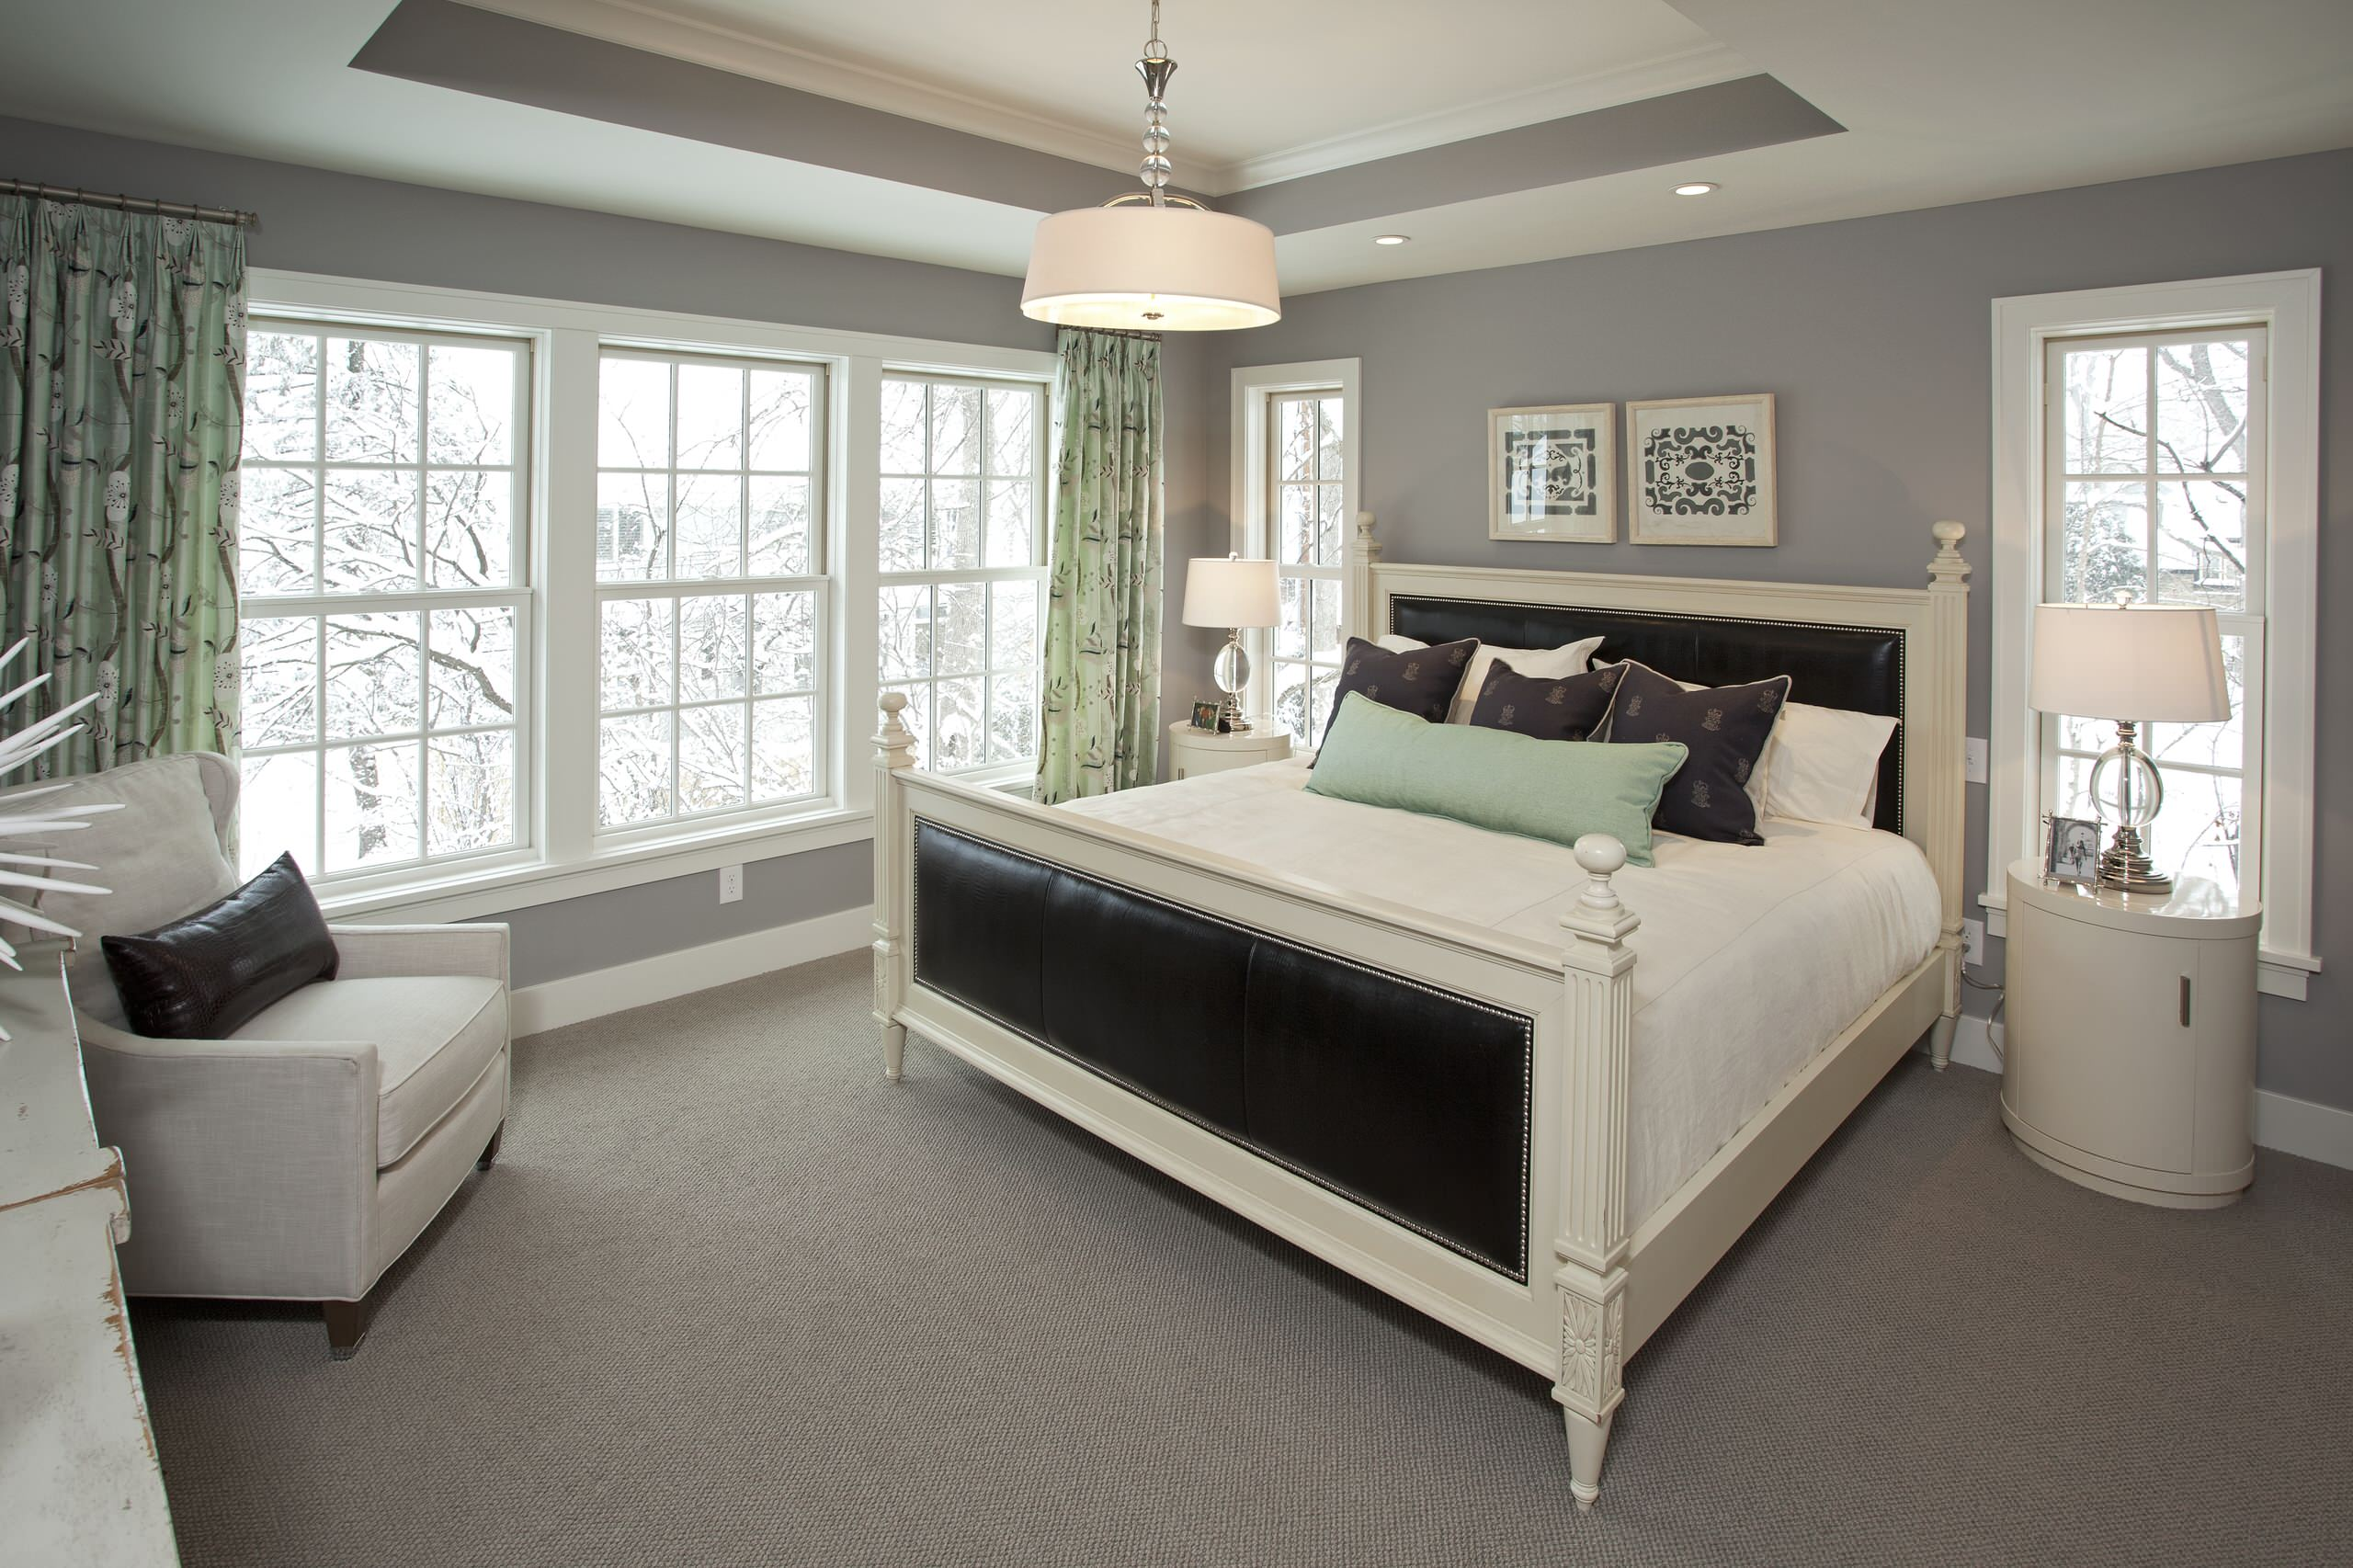 14 x 14 bedroom ideas & photos | houzz